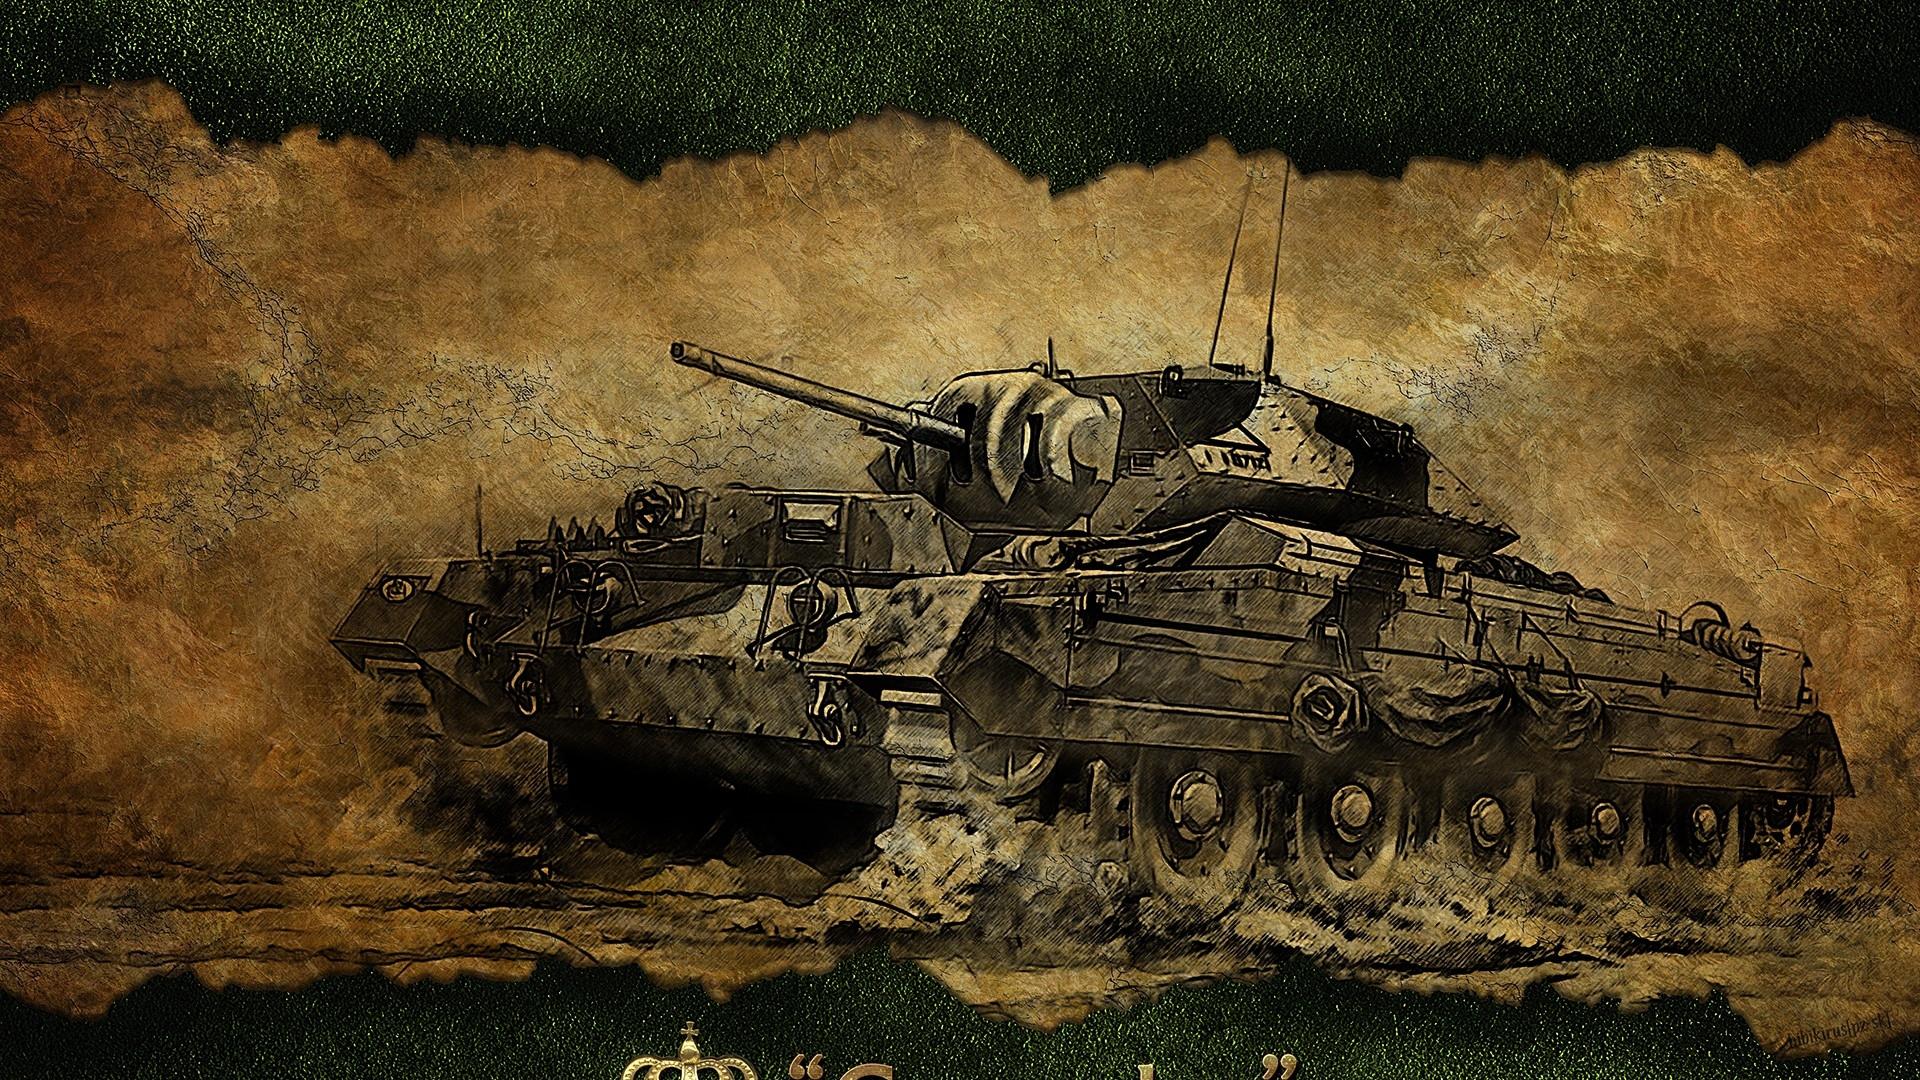 Templar wallpaper templar wallpaper backgrounds knights templar - Download Wallpaper 1920x1080 World Of Tanks Crusader